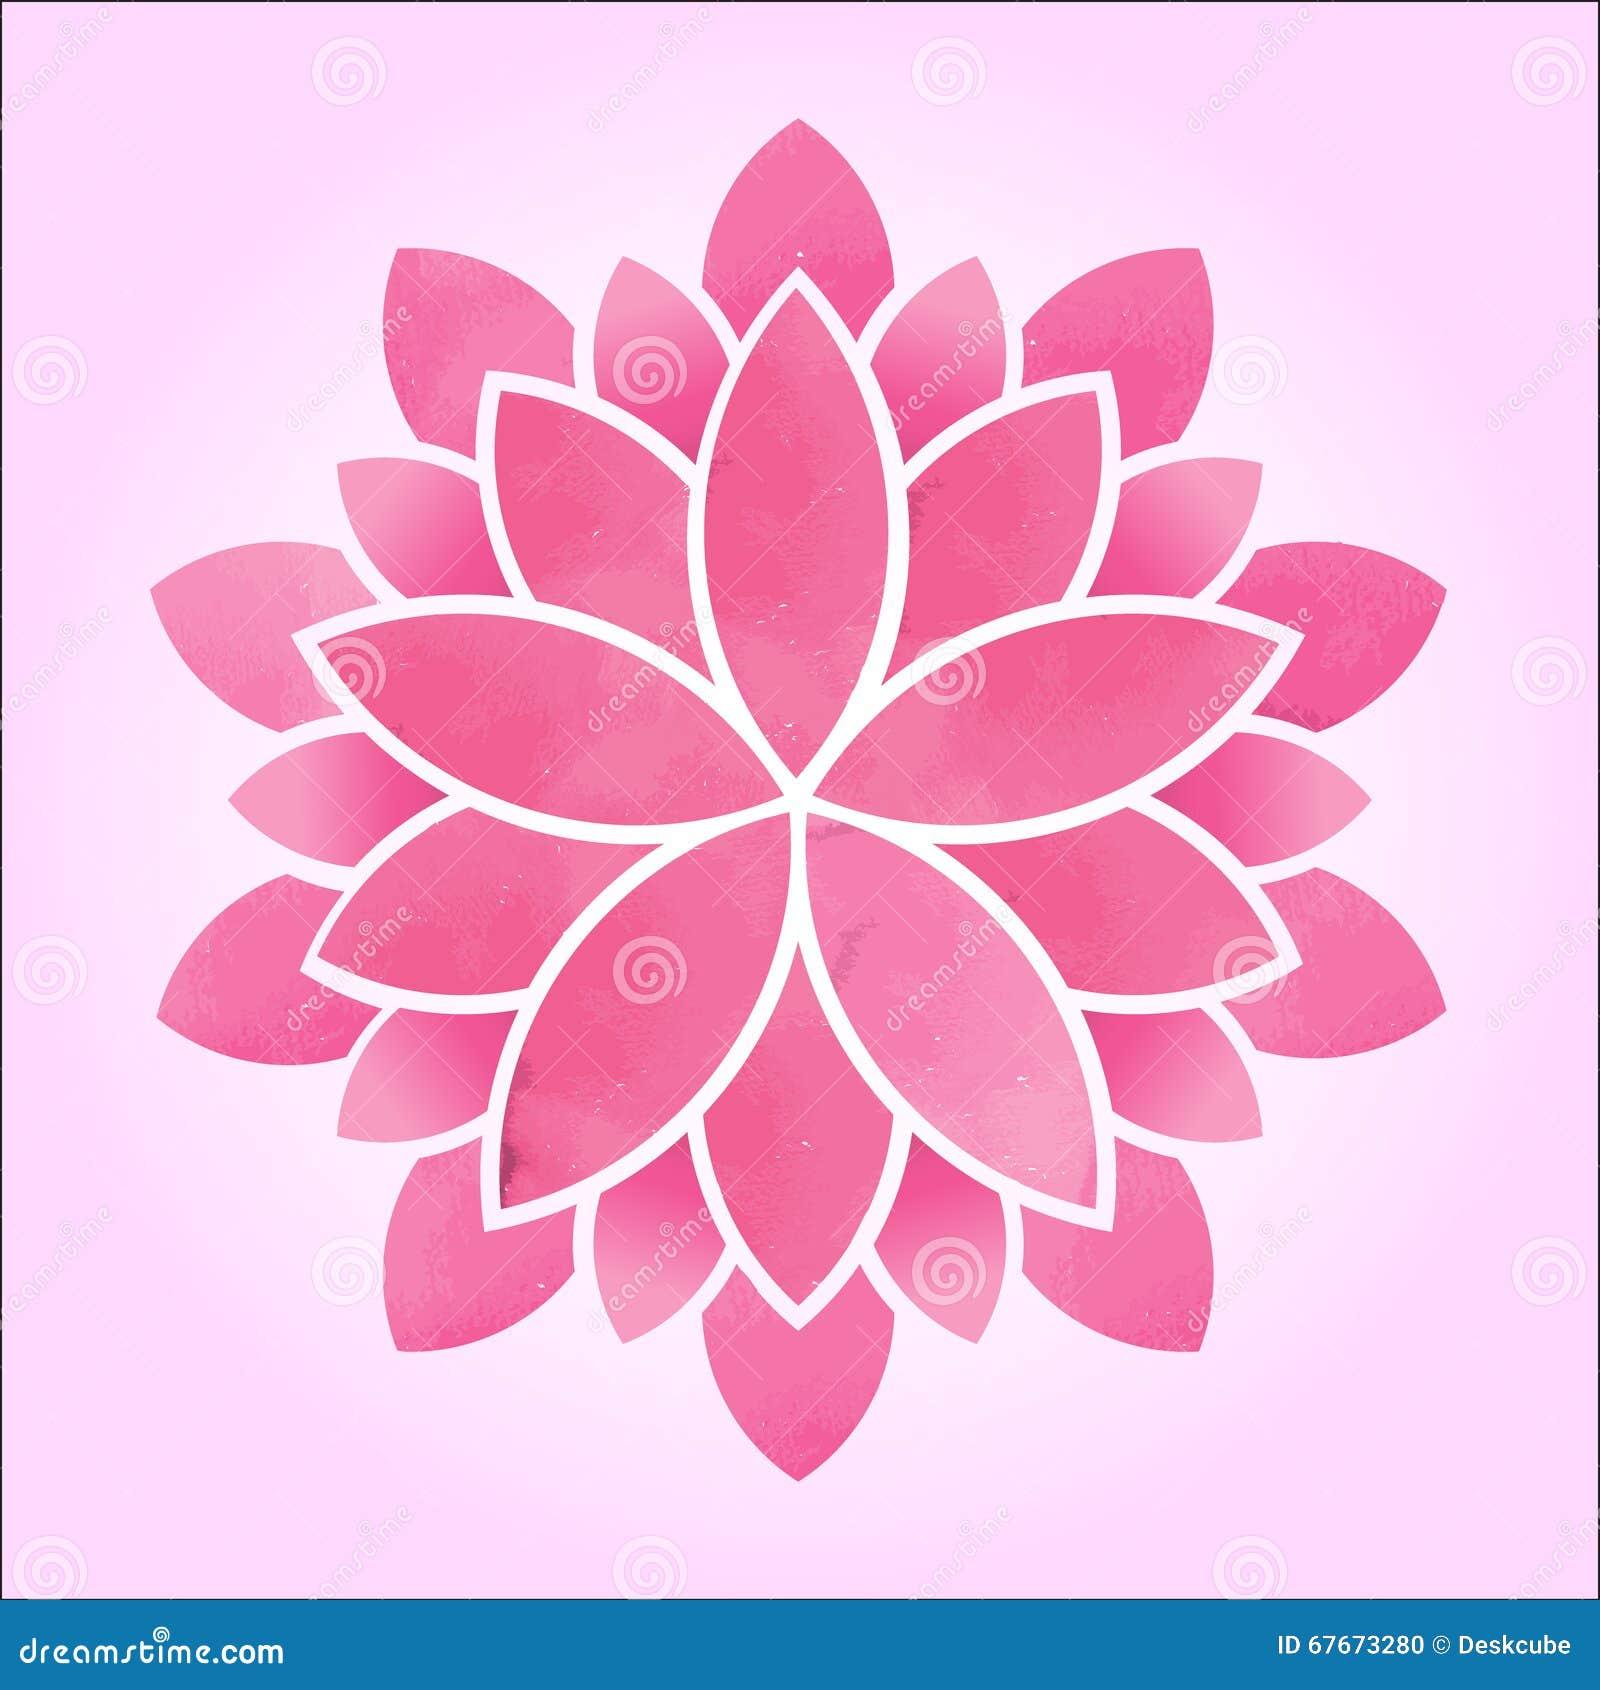 download 5d lotus flower - photo #33